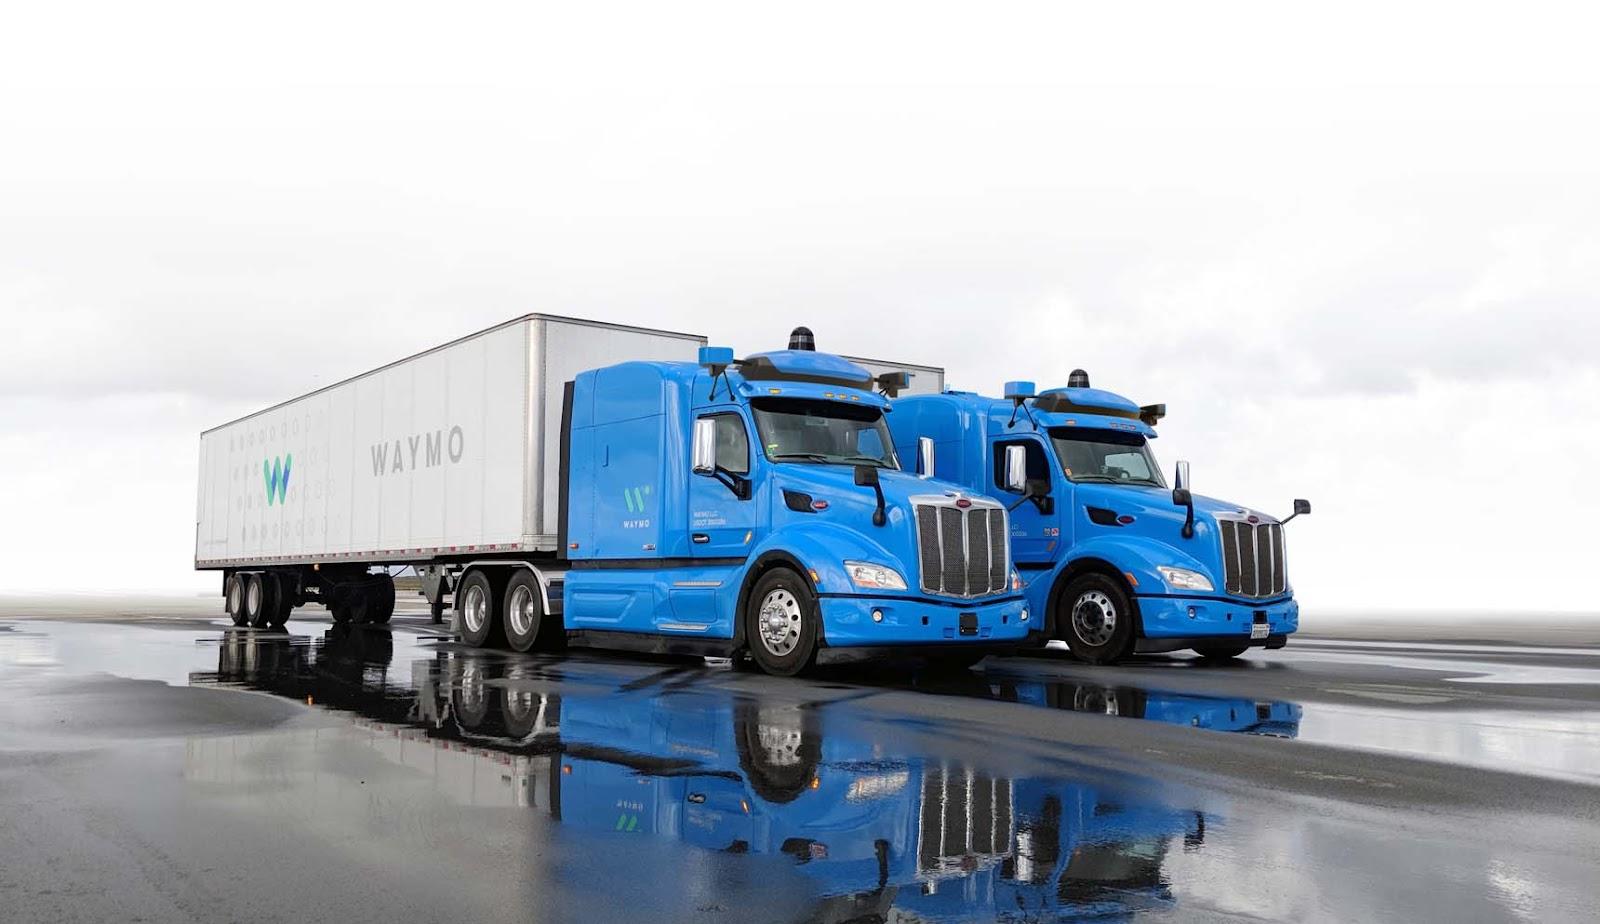 camiones waymo